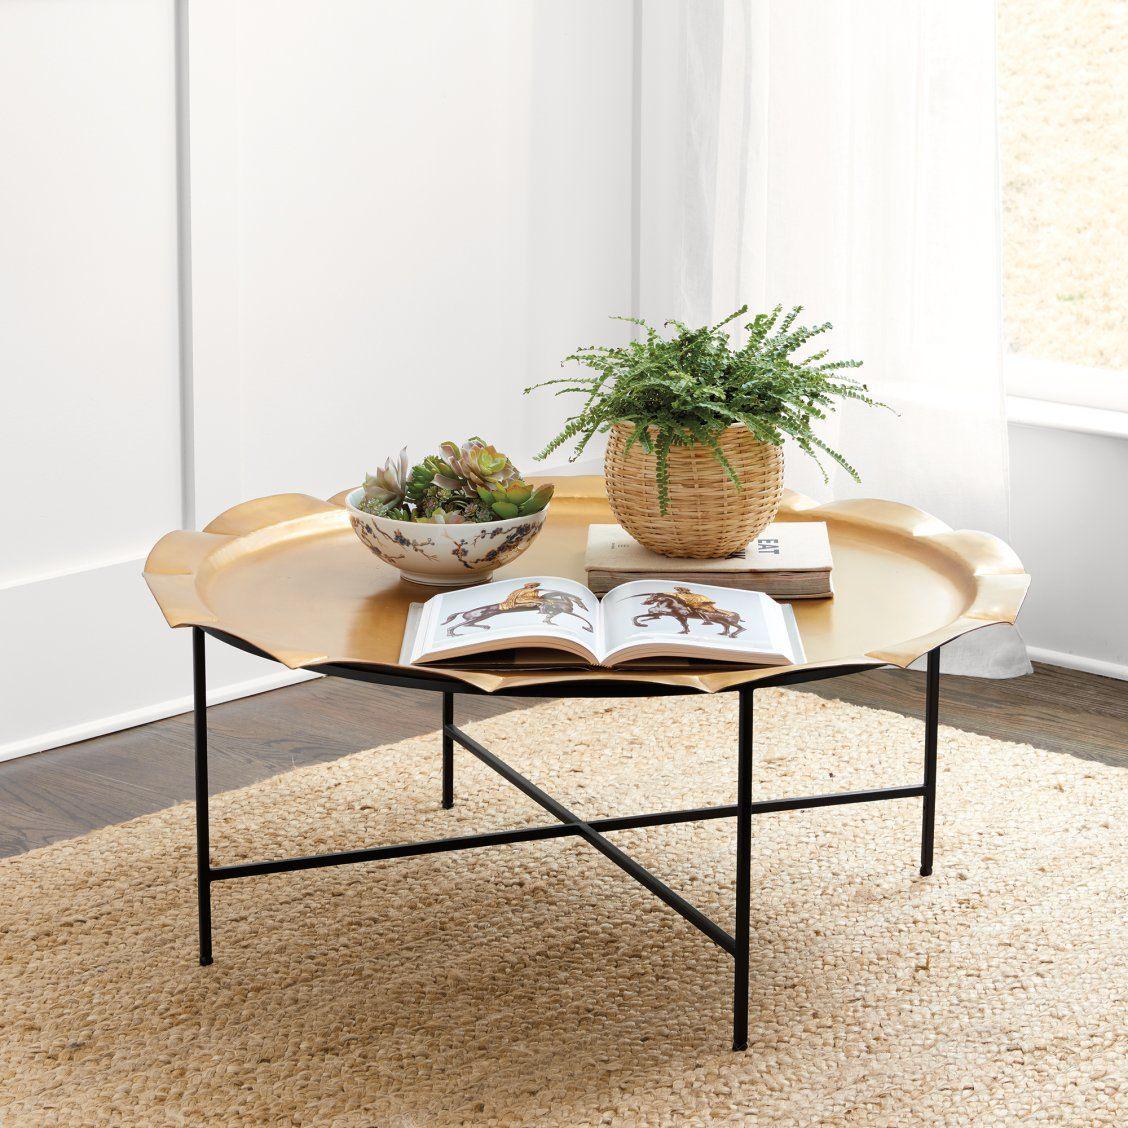 Tamarind Brass Coffee Table Coffee Table Brass Coffee Table Coffee Table Setting [ 1128 x 1128 Pixel ]